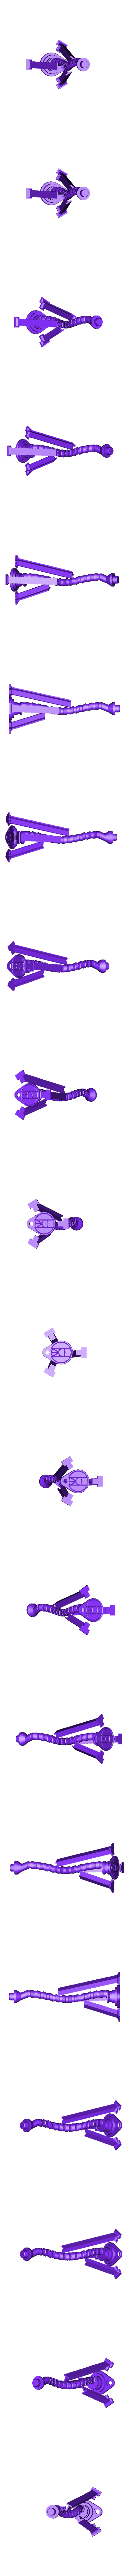 Crankshaft_30%2BSUPPORTS.stl Download STL file Shape Shaker_Caterpillar • Design to 3D print, Ocrobus